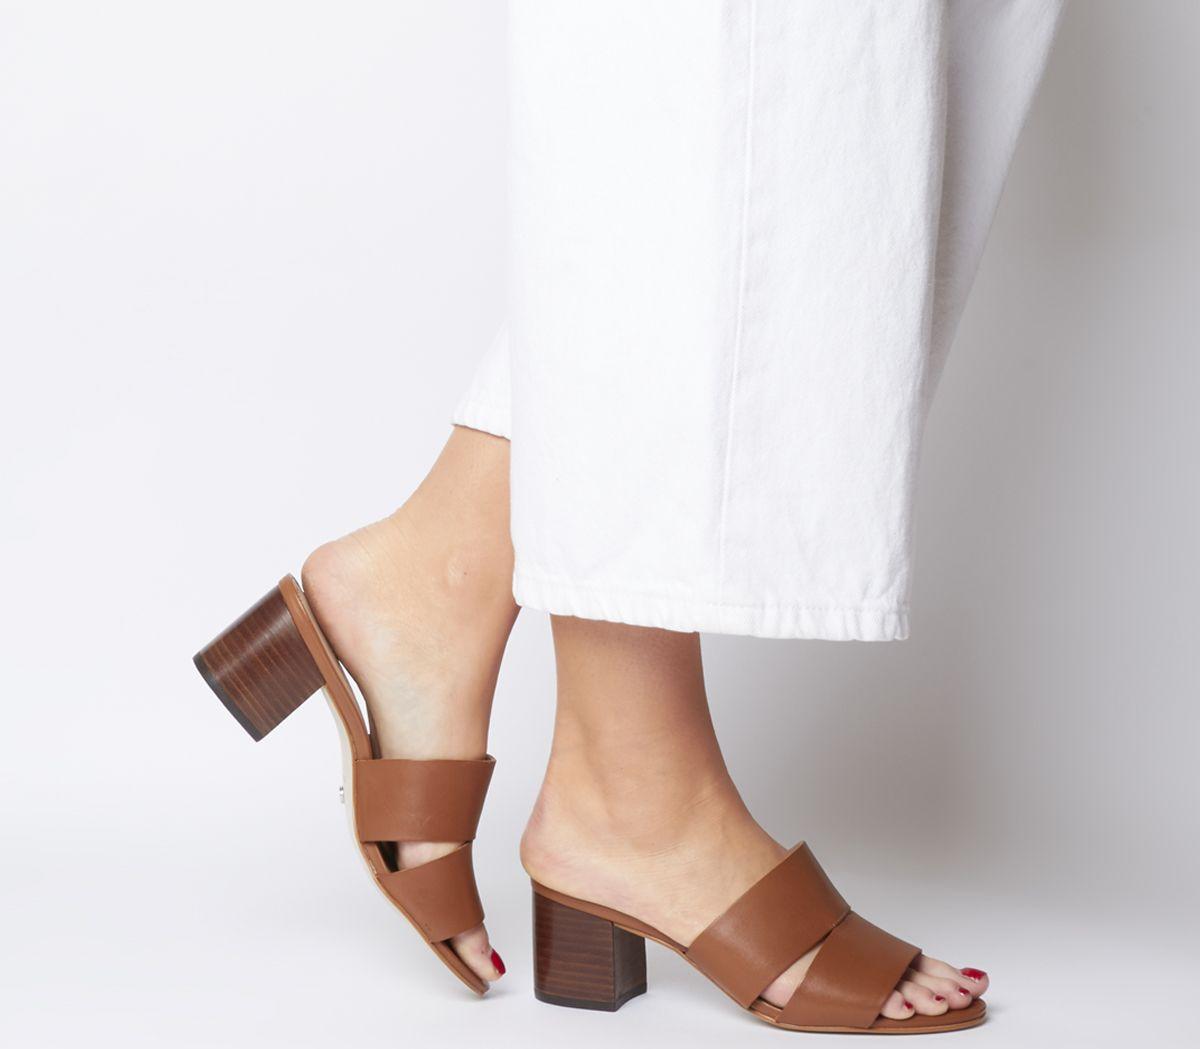 cfcf6bda96192 Sentinel Thumbnail 1. Sentinel Womens Office Malena Cut Out Mules Tan  Leather Heels